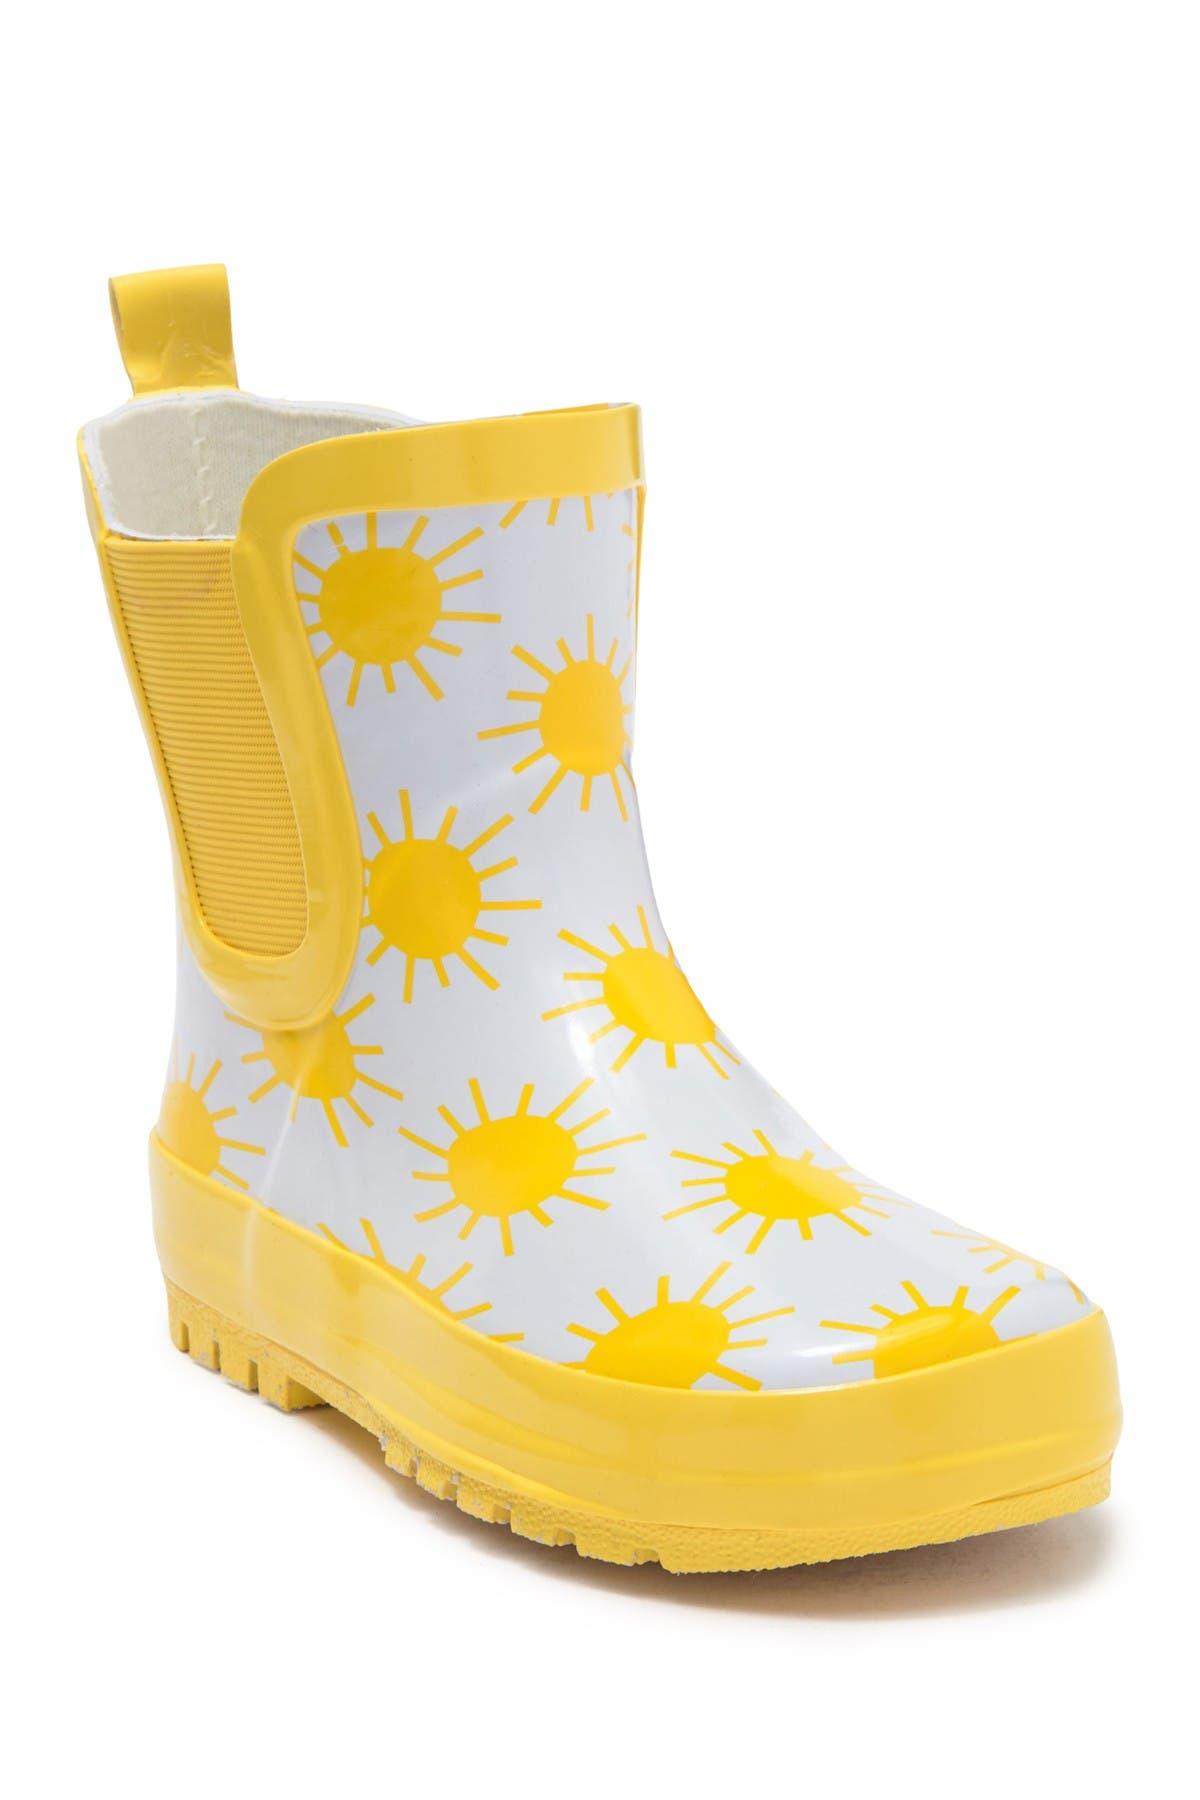 Image of Tucker + Tate River Rain Boot